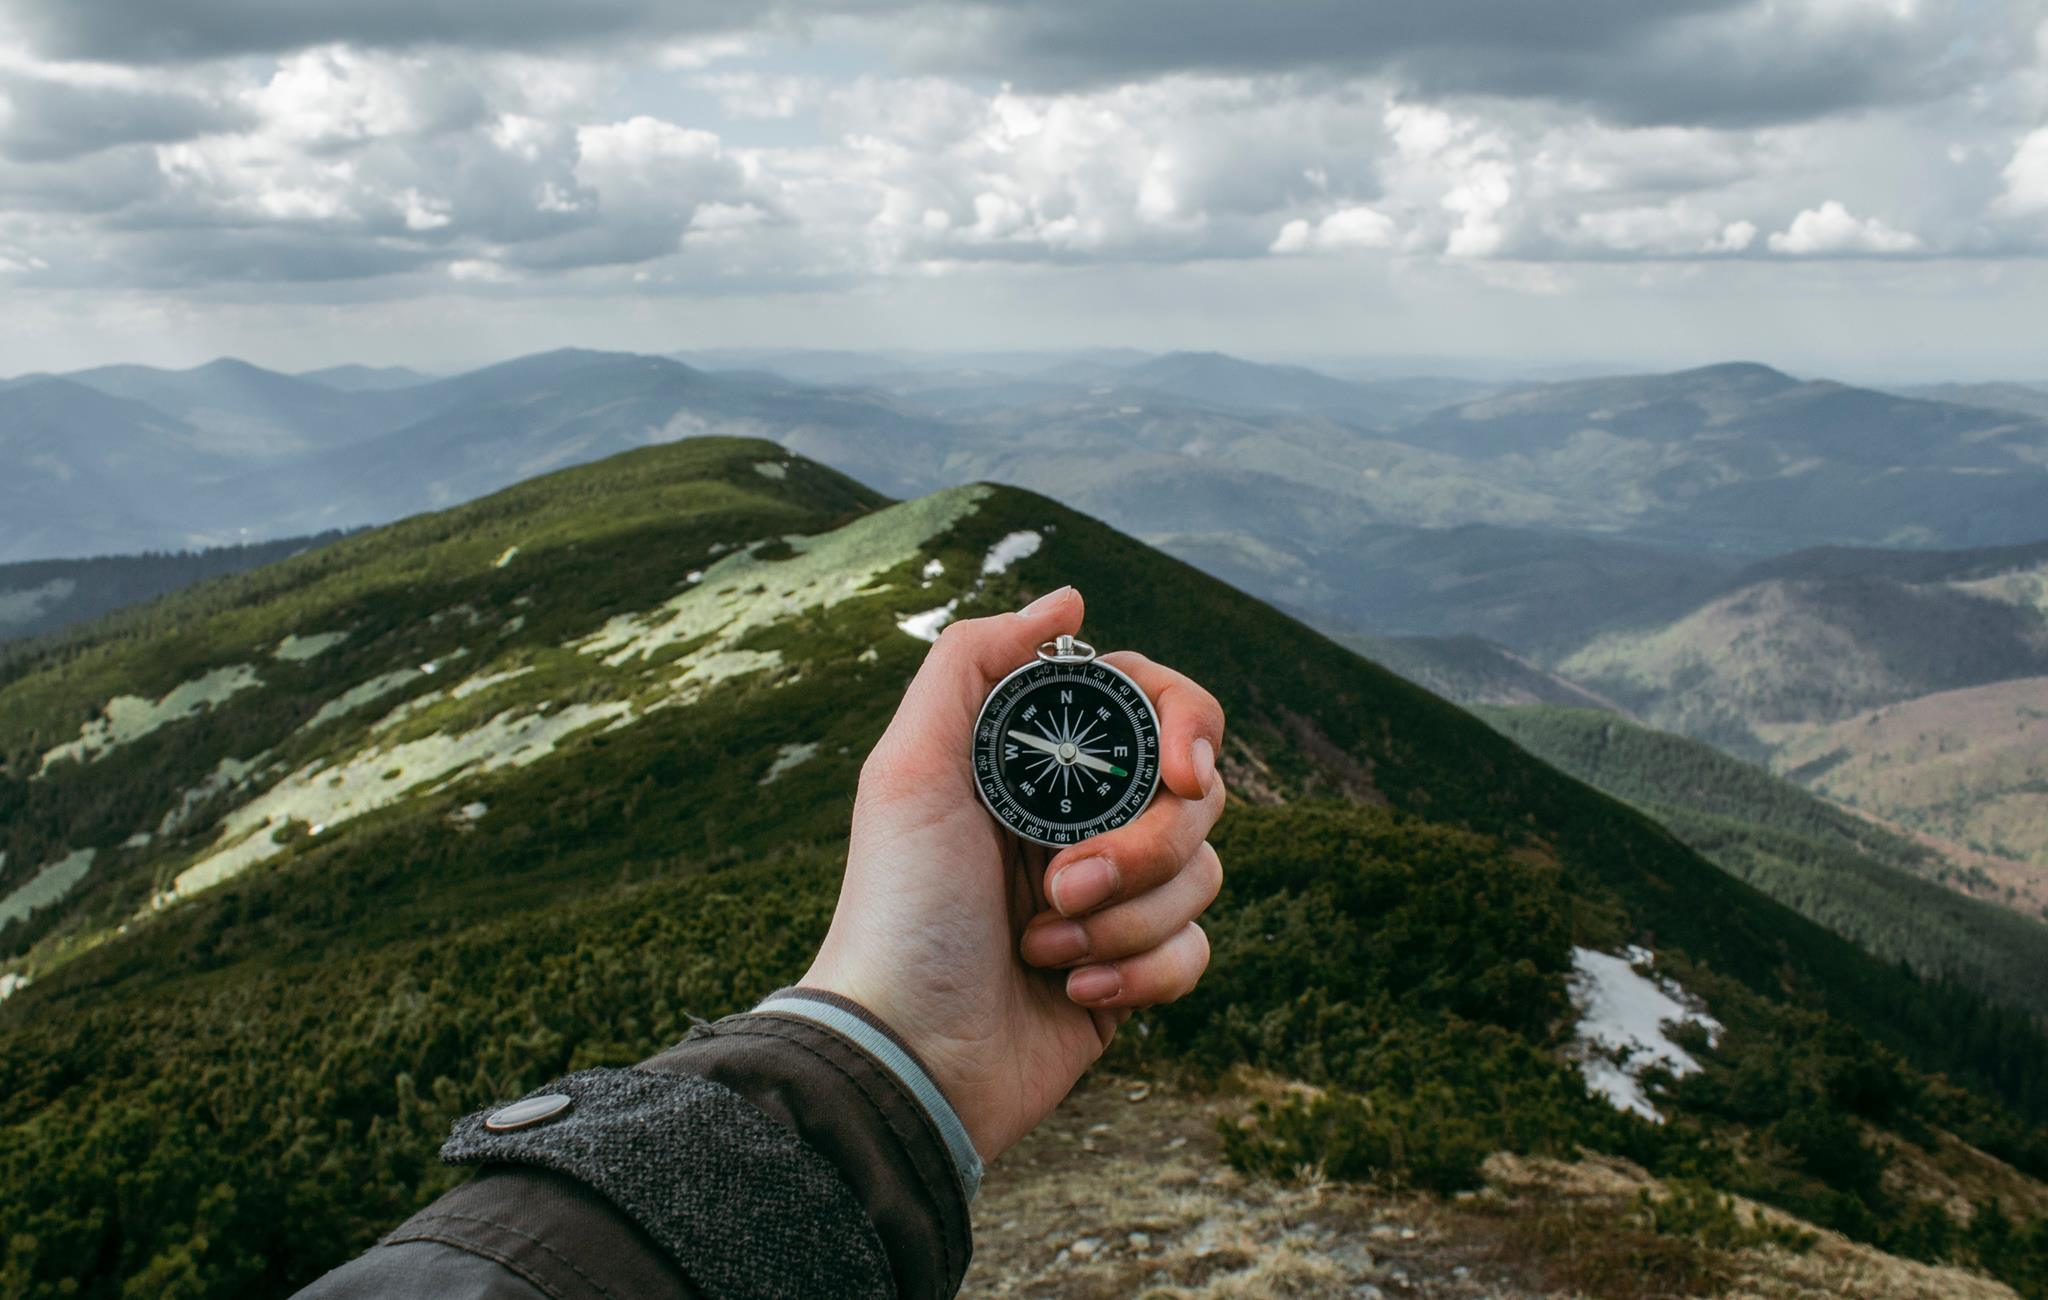 hfl compass photo.jpg